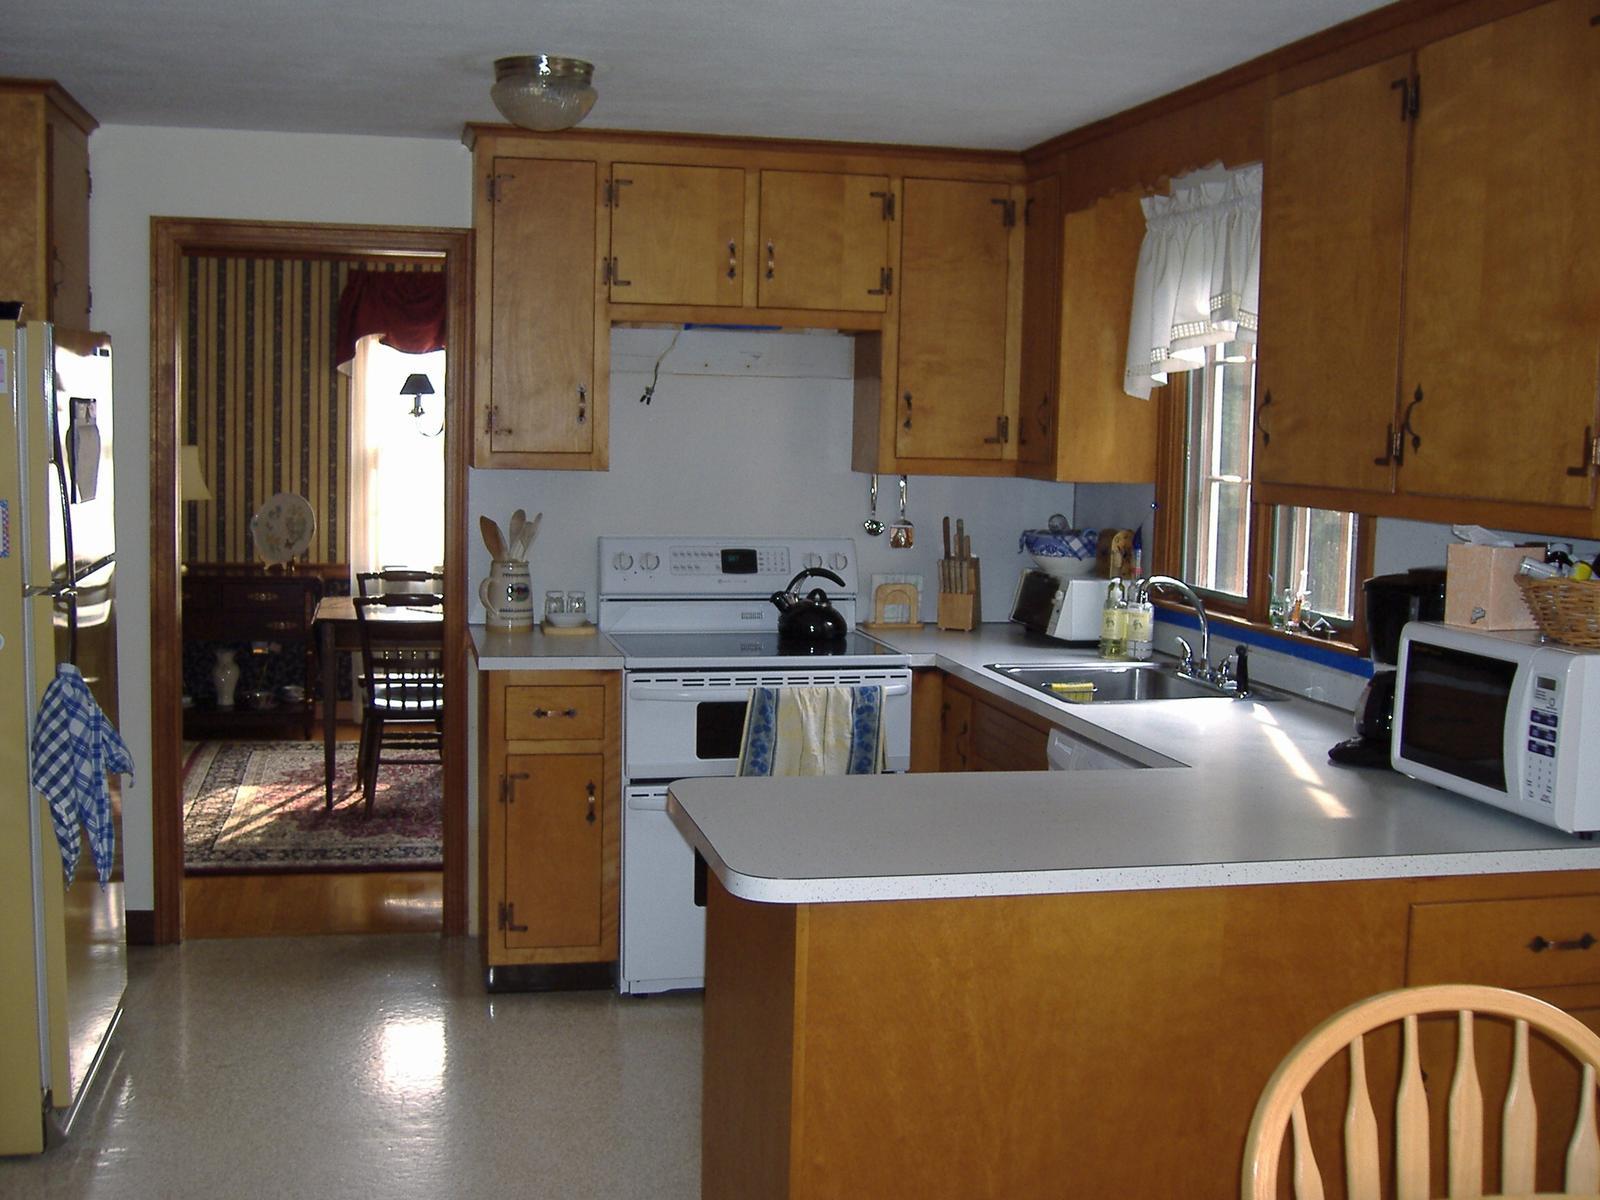 granite kitchen remodeling hartford area kitchen remodel ct Granite Kitchen remodeling Hartford area